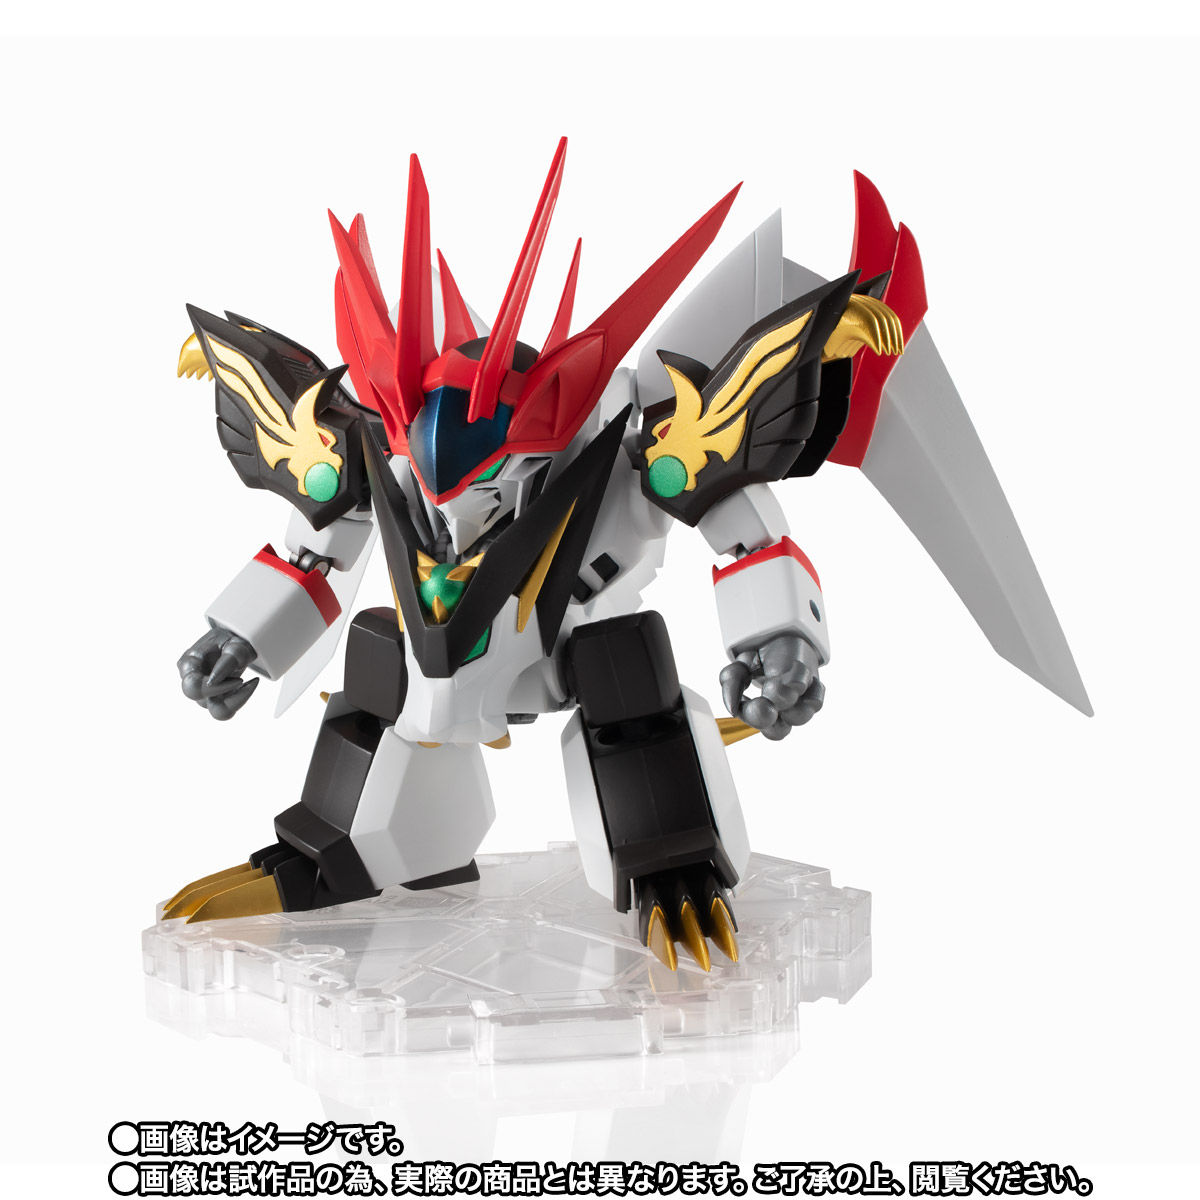 NXEDGE STYLE[MASHIN UNIT]『白虎丸』魔神英雄伝ワタル 可動フィギュア-006